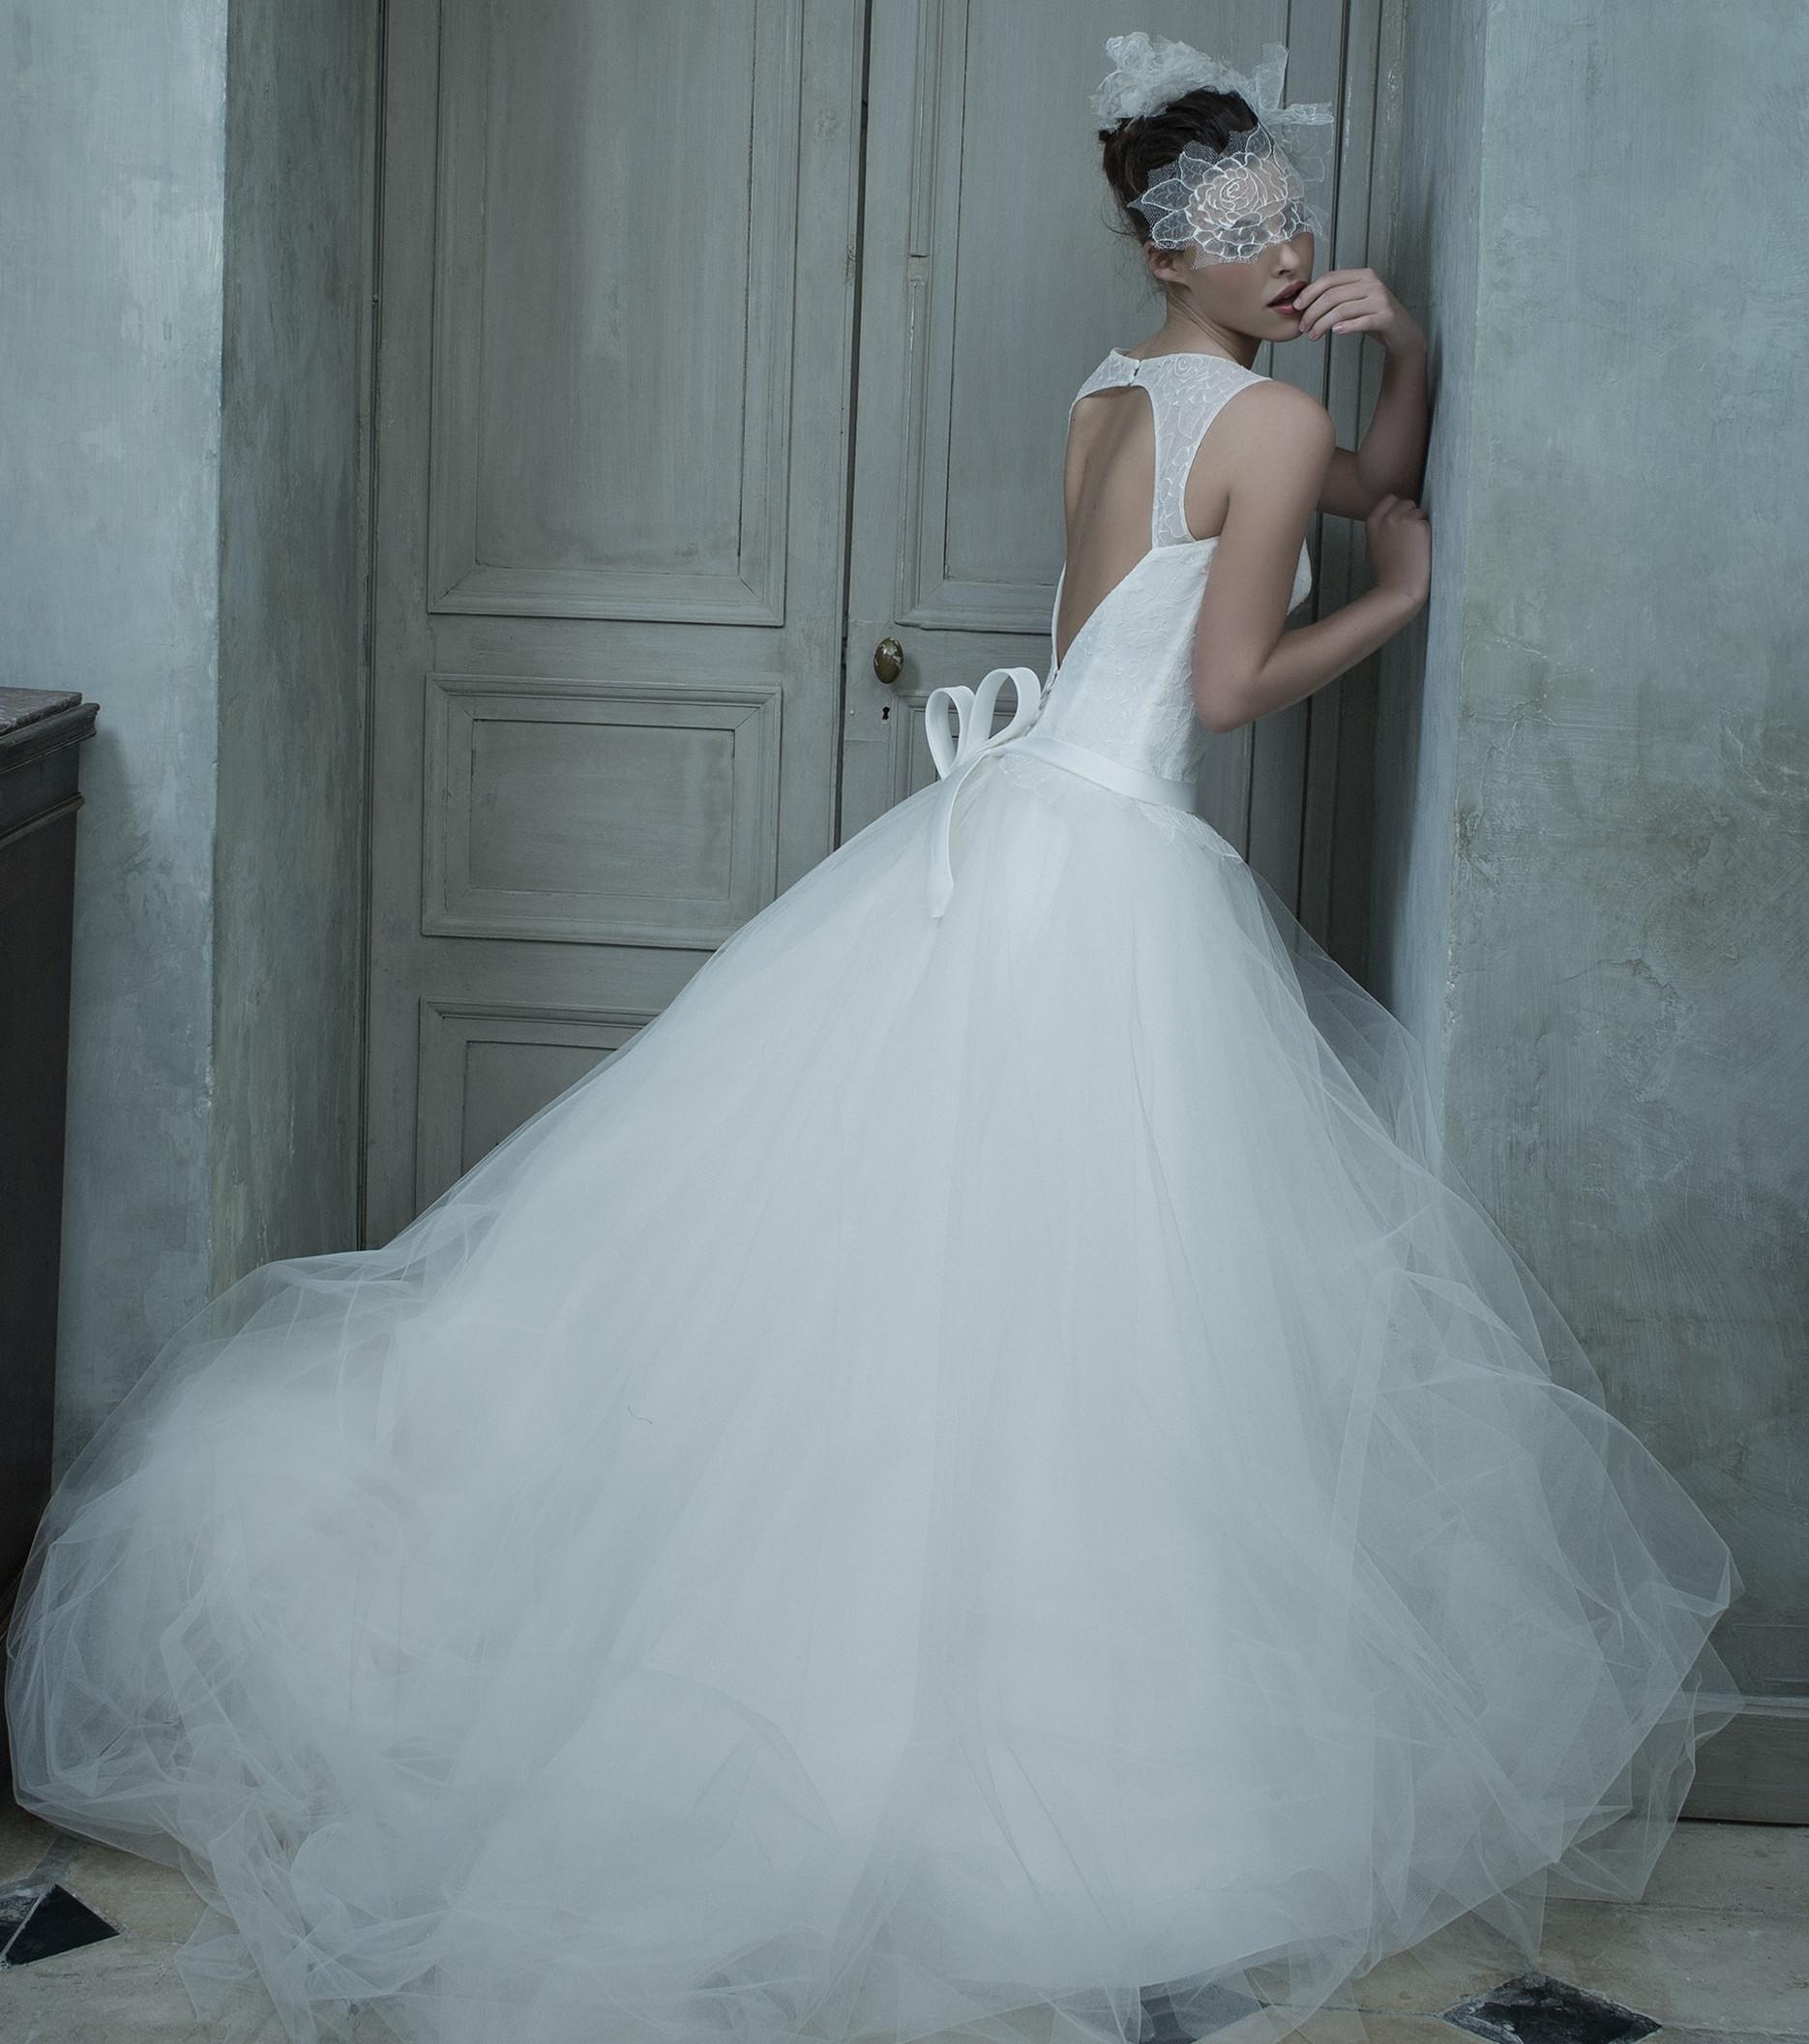 Funky Wedding Dresses Pensacola Sketch - All Wedding Dresses ...